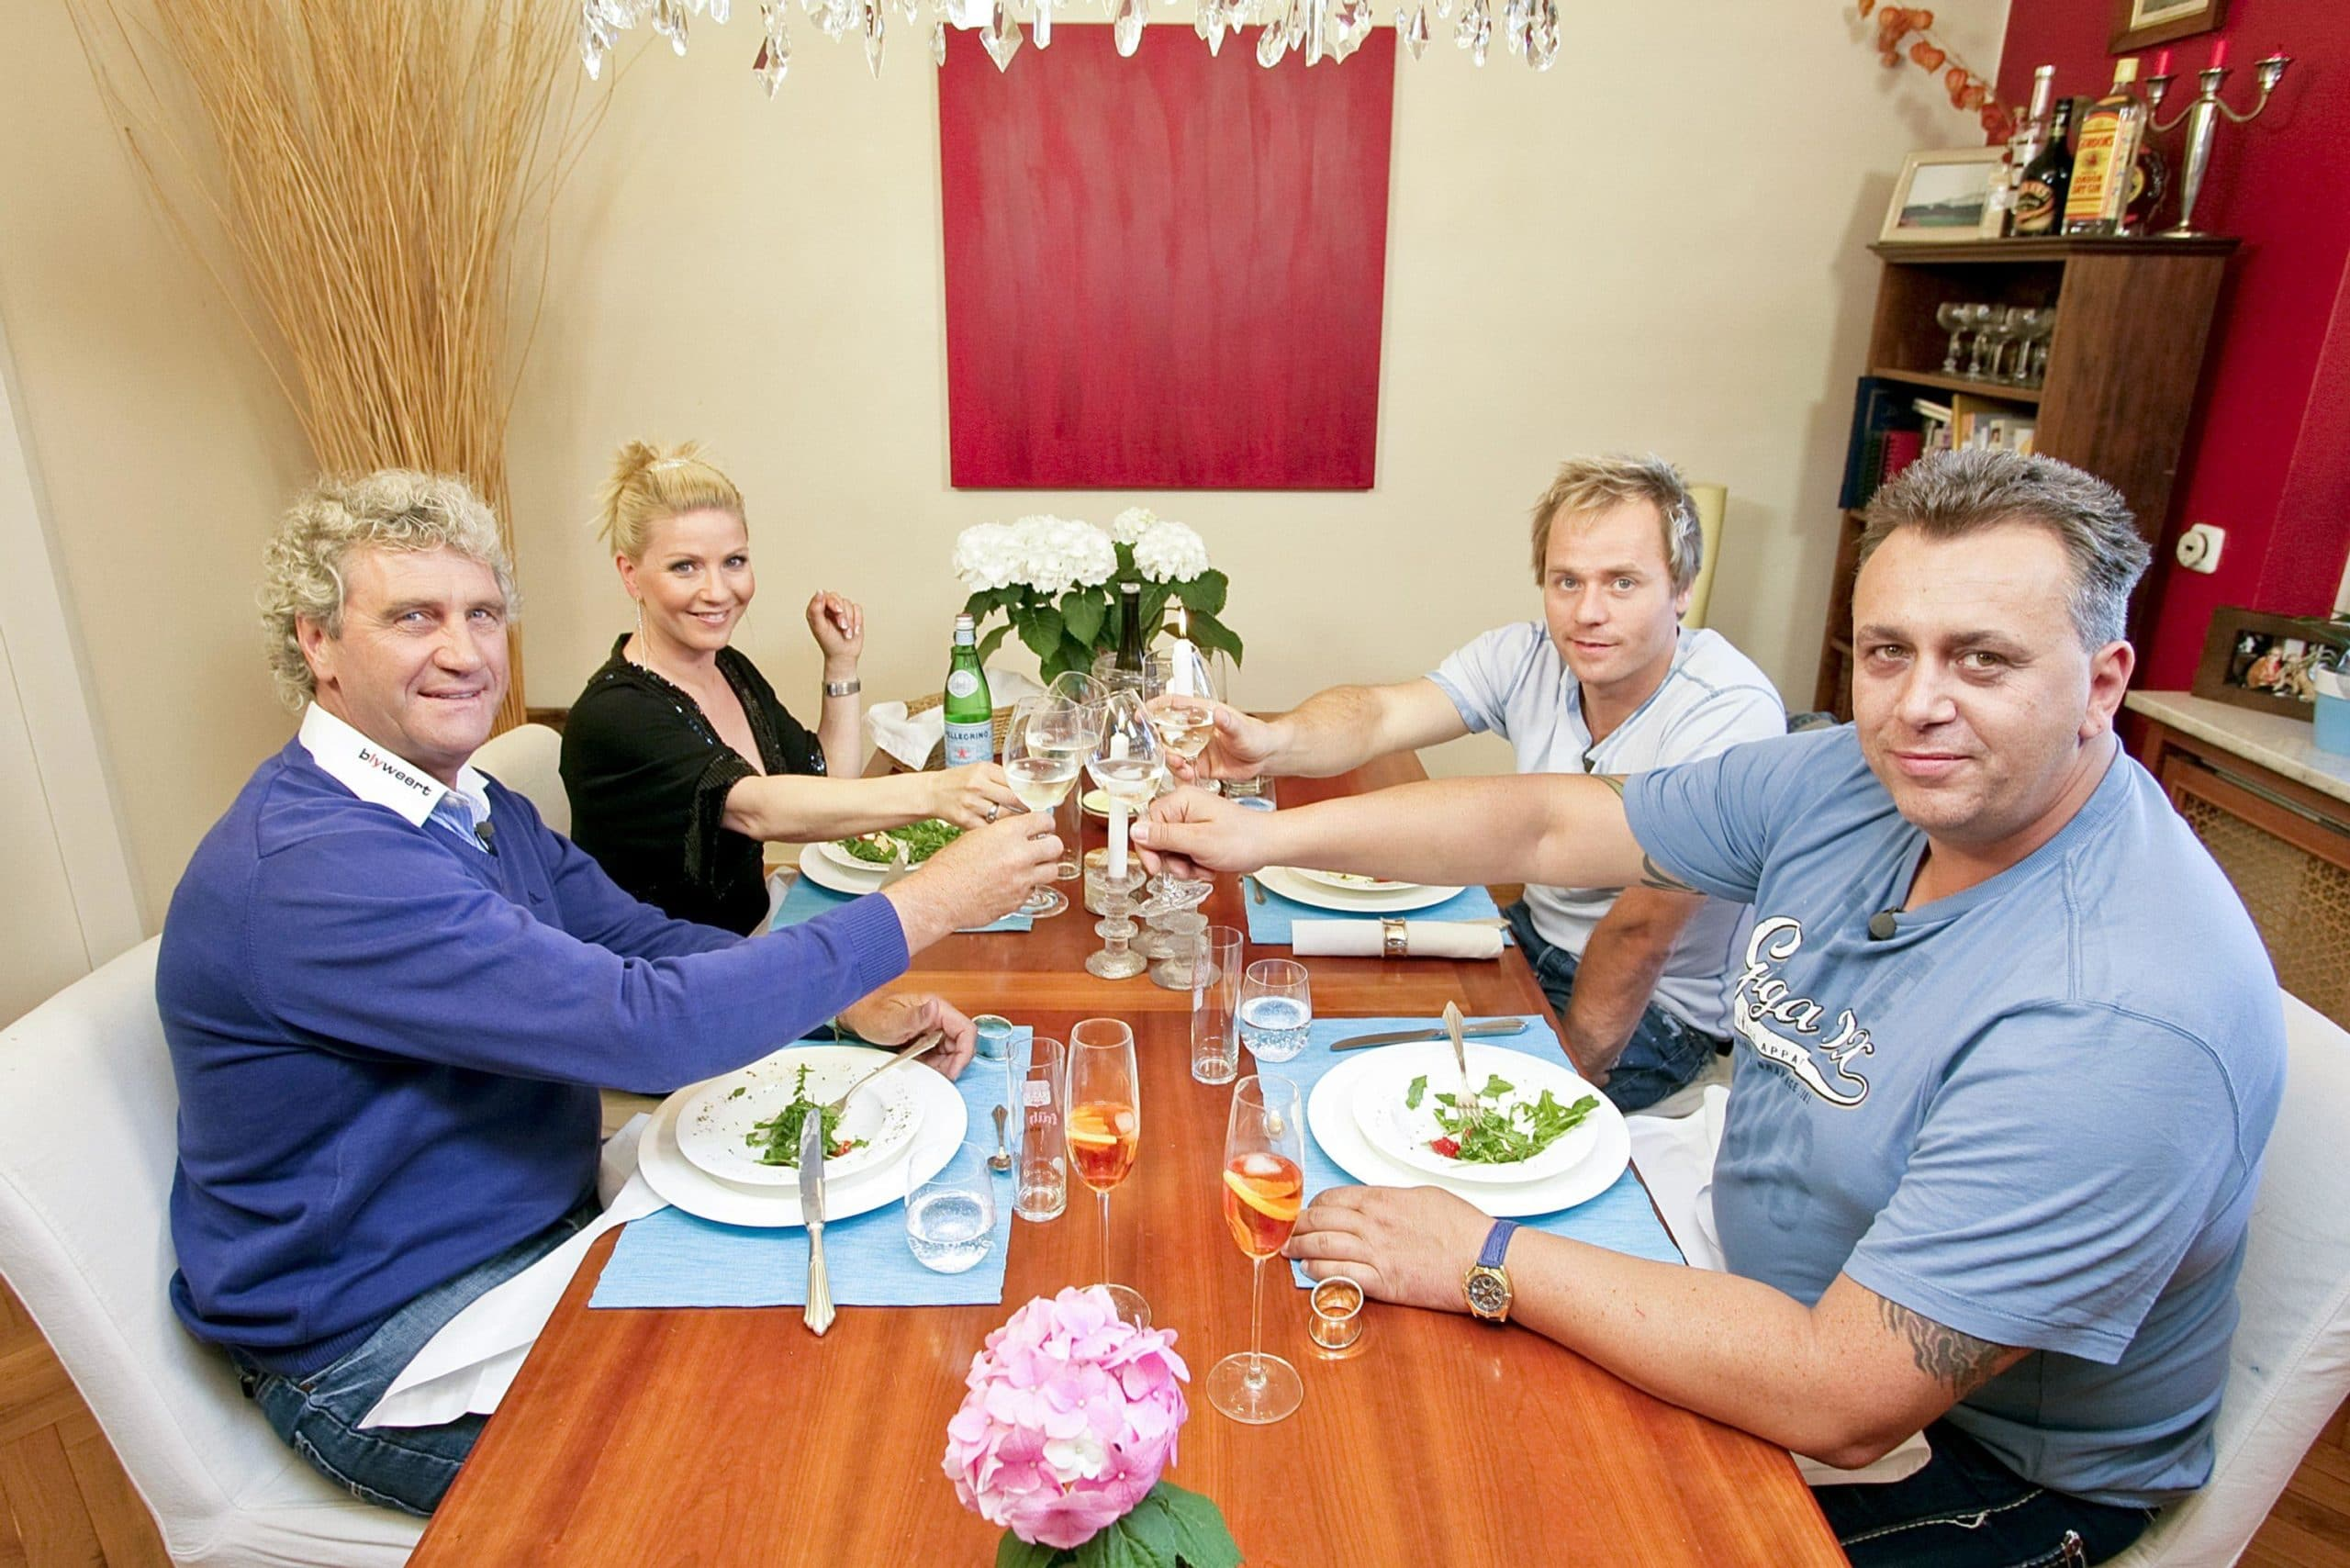 Jean-Marie Pfaff, Gastgeberin Aleksandra Bechtel, Dustin Semmelrogge und Frank Fussbroich